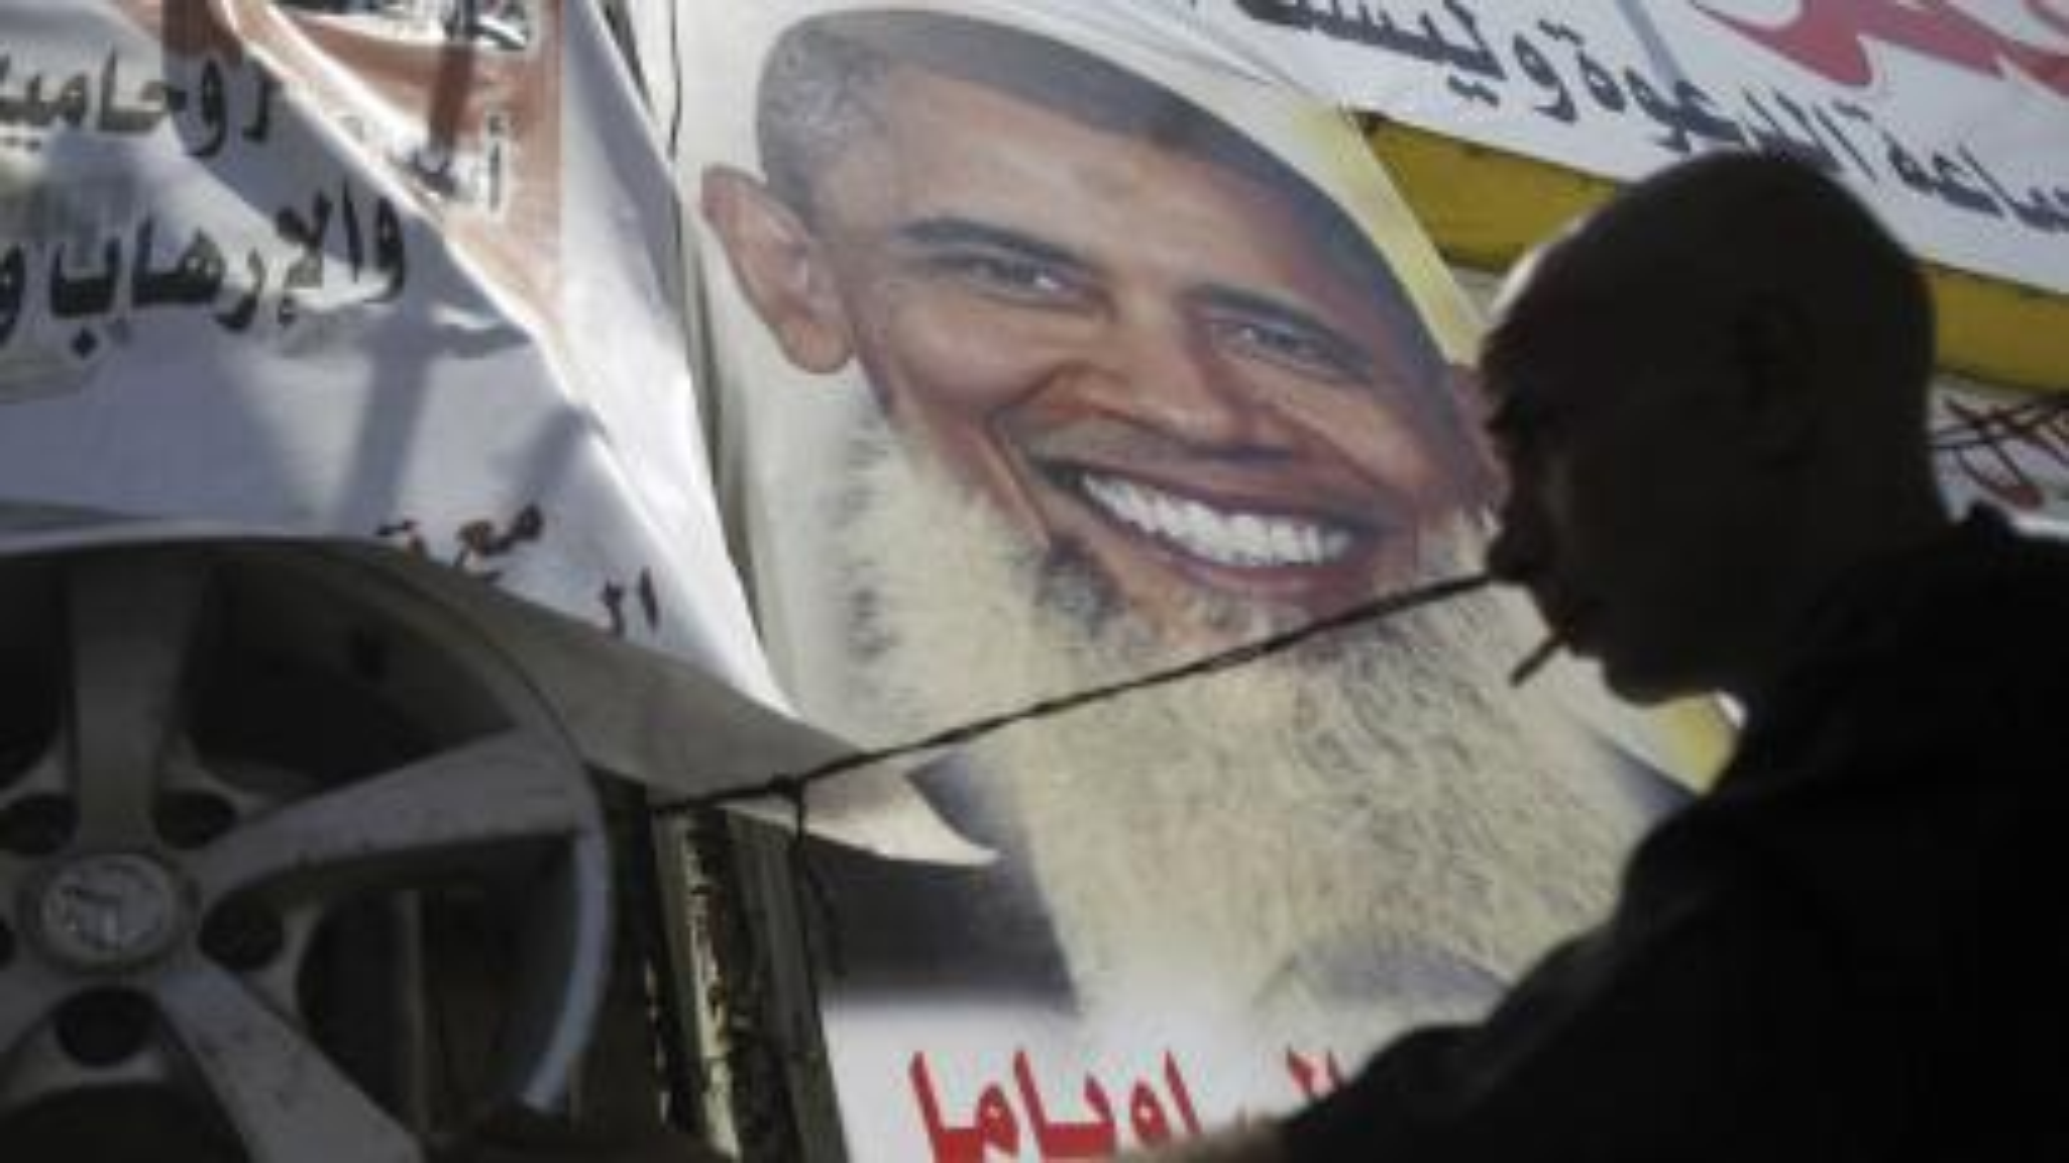 obama, shia, muslim